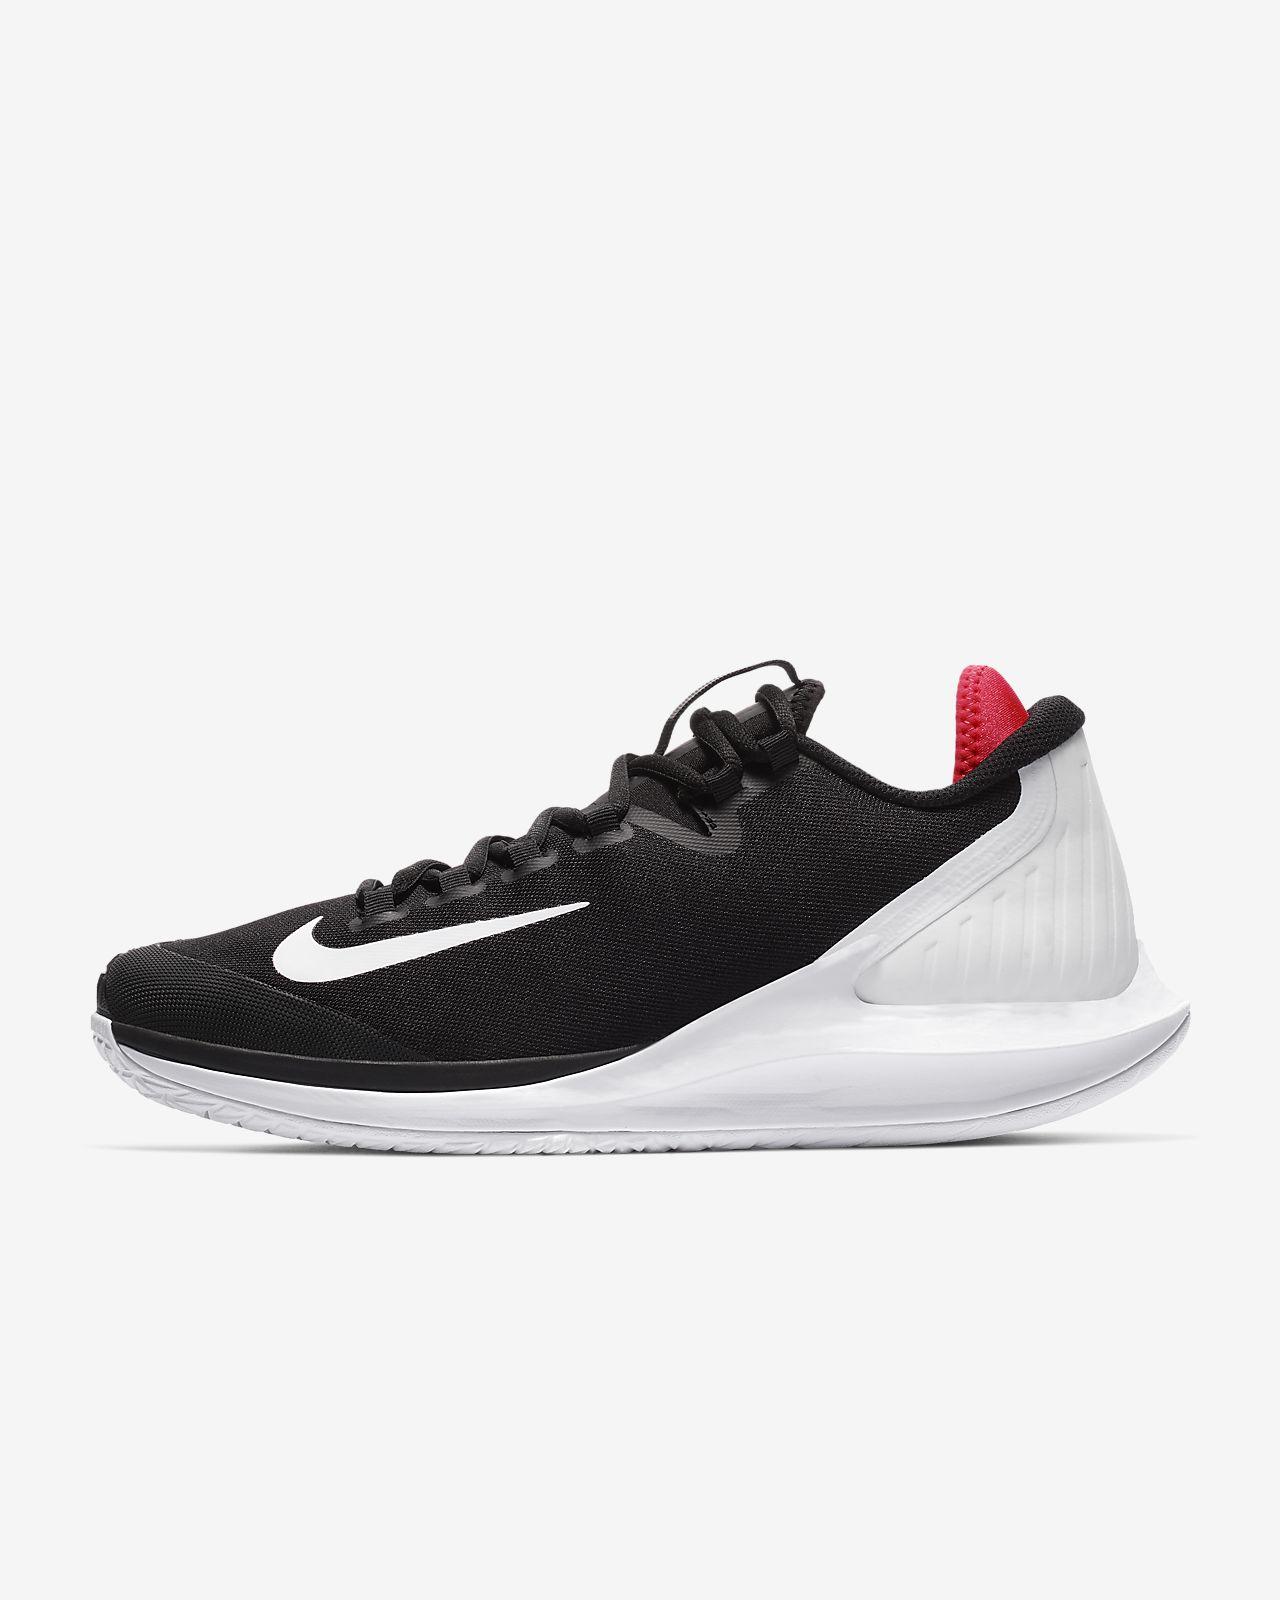 4bd2a5cadfa1 Chaussure de tennis NikeCourt Air Zoom Zero pour Homme. Nike.com CH